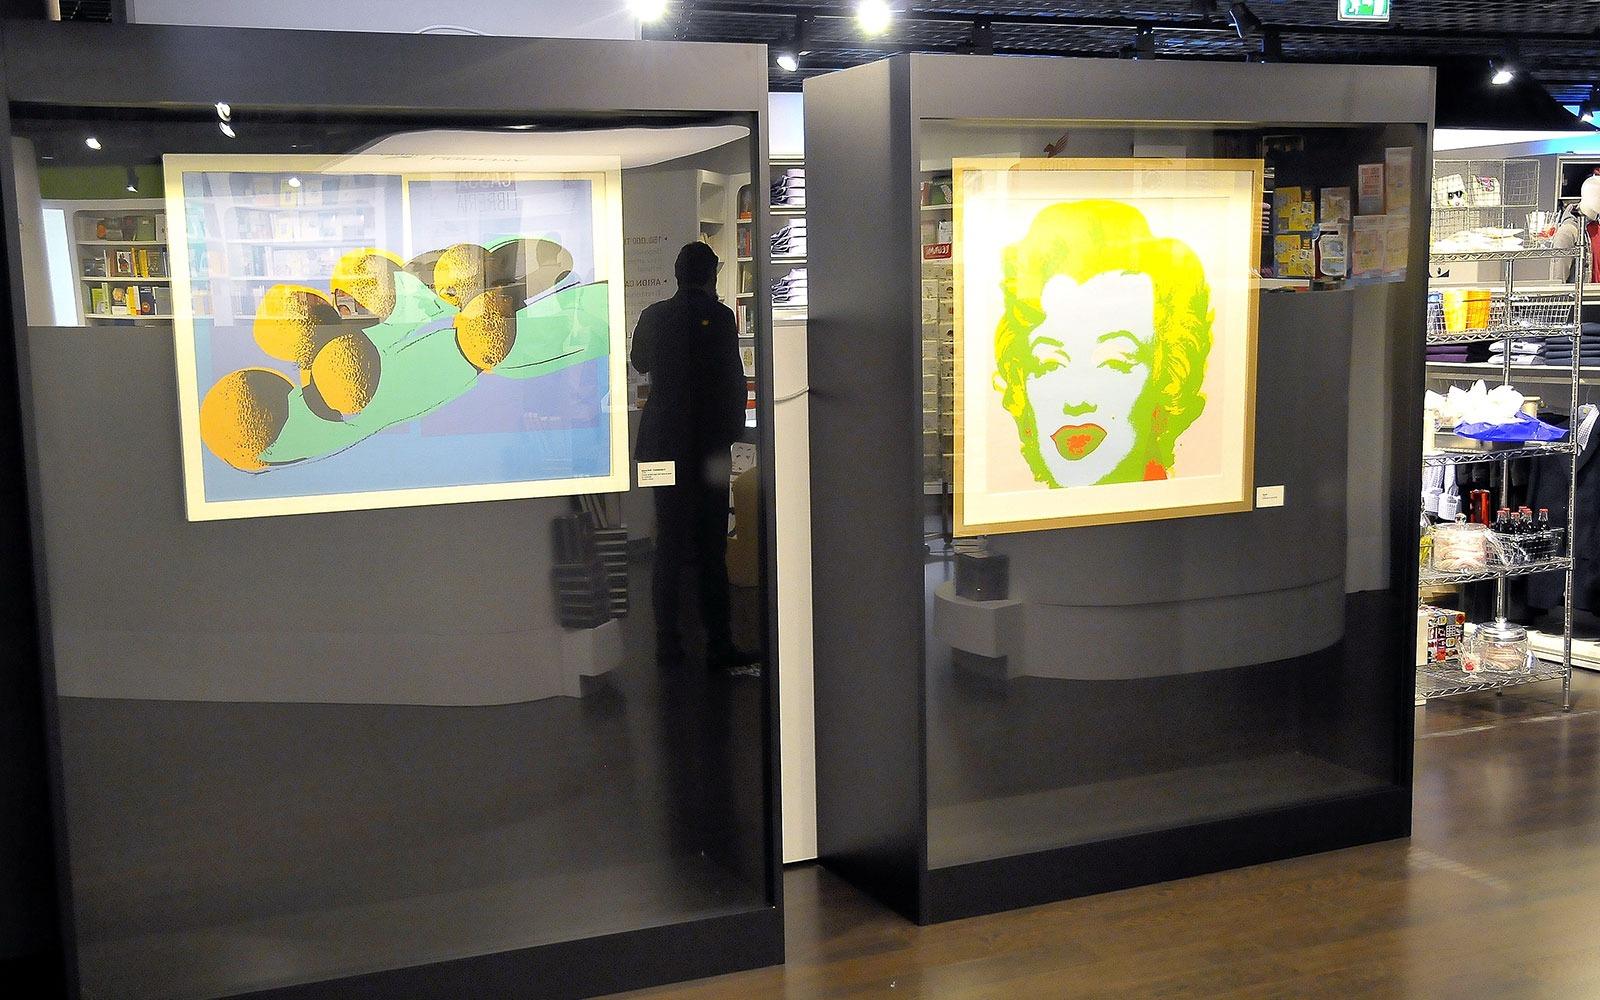 Teche Upim - Andy Warhol